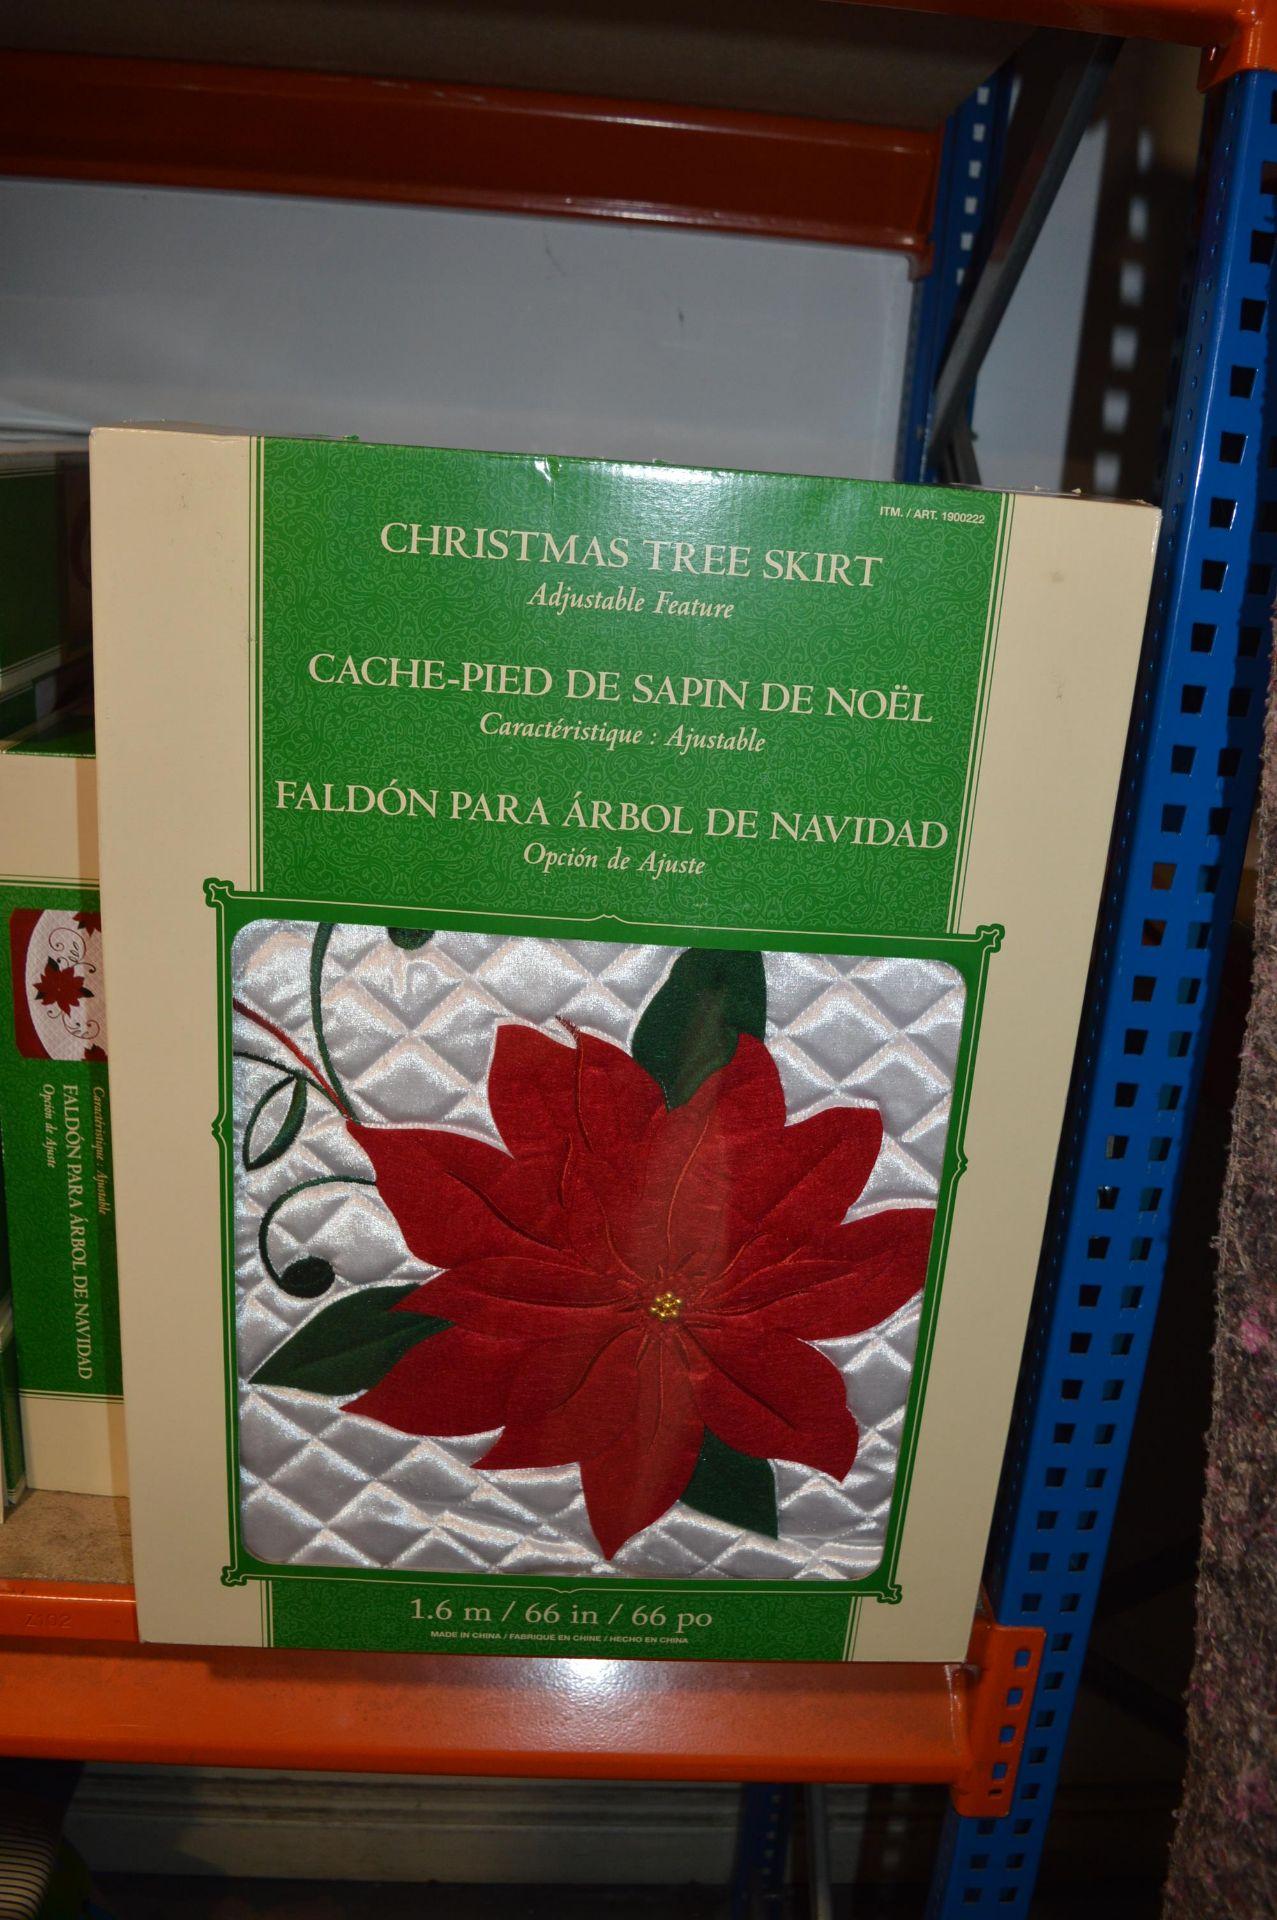 Lot 22 - *Christmas Tree Skirt 1.6m